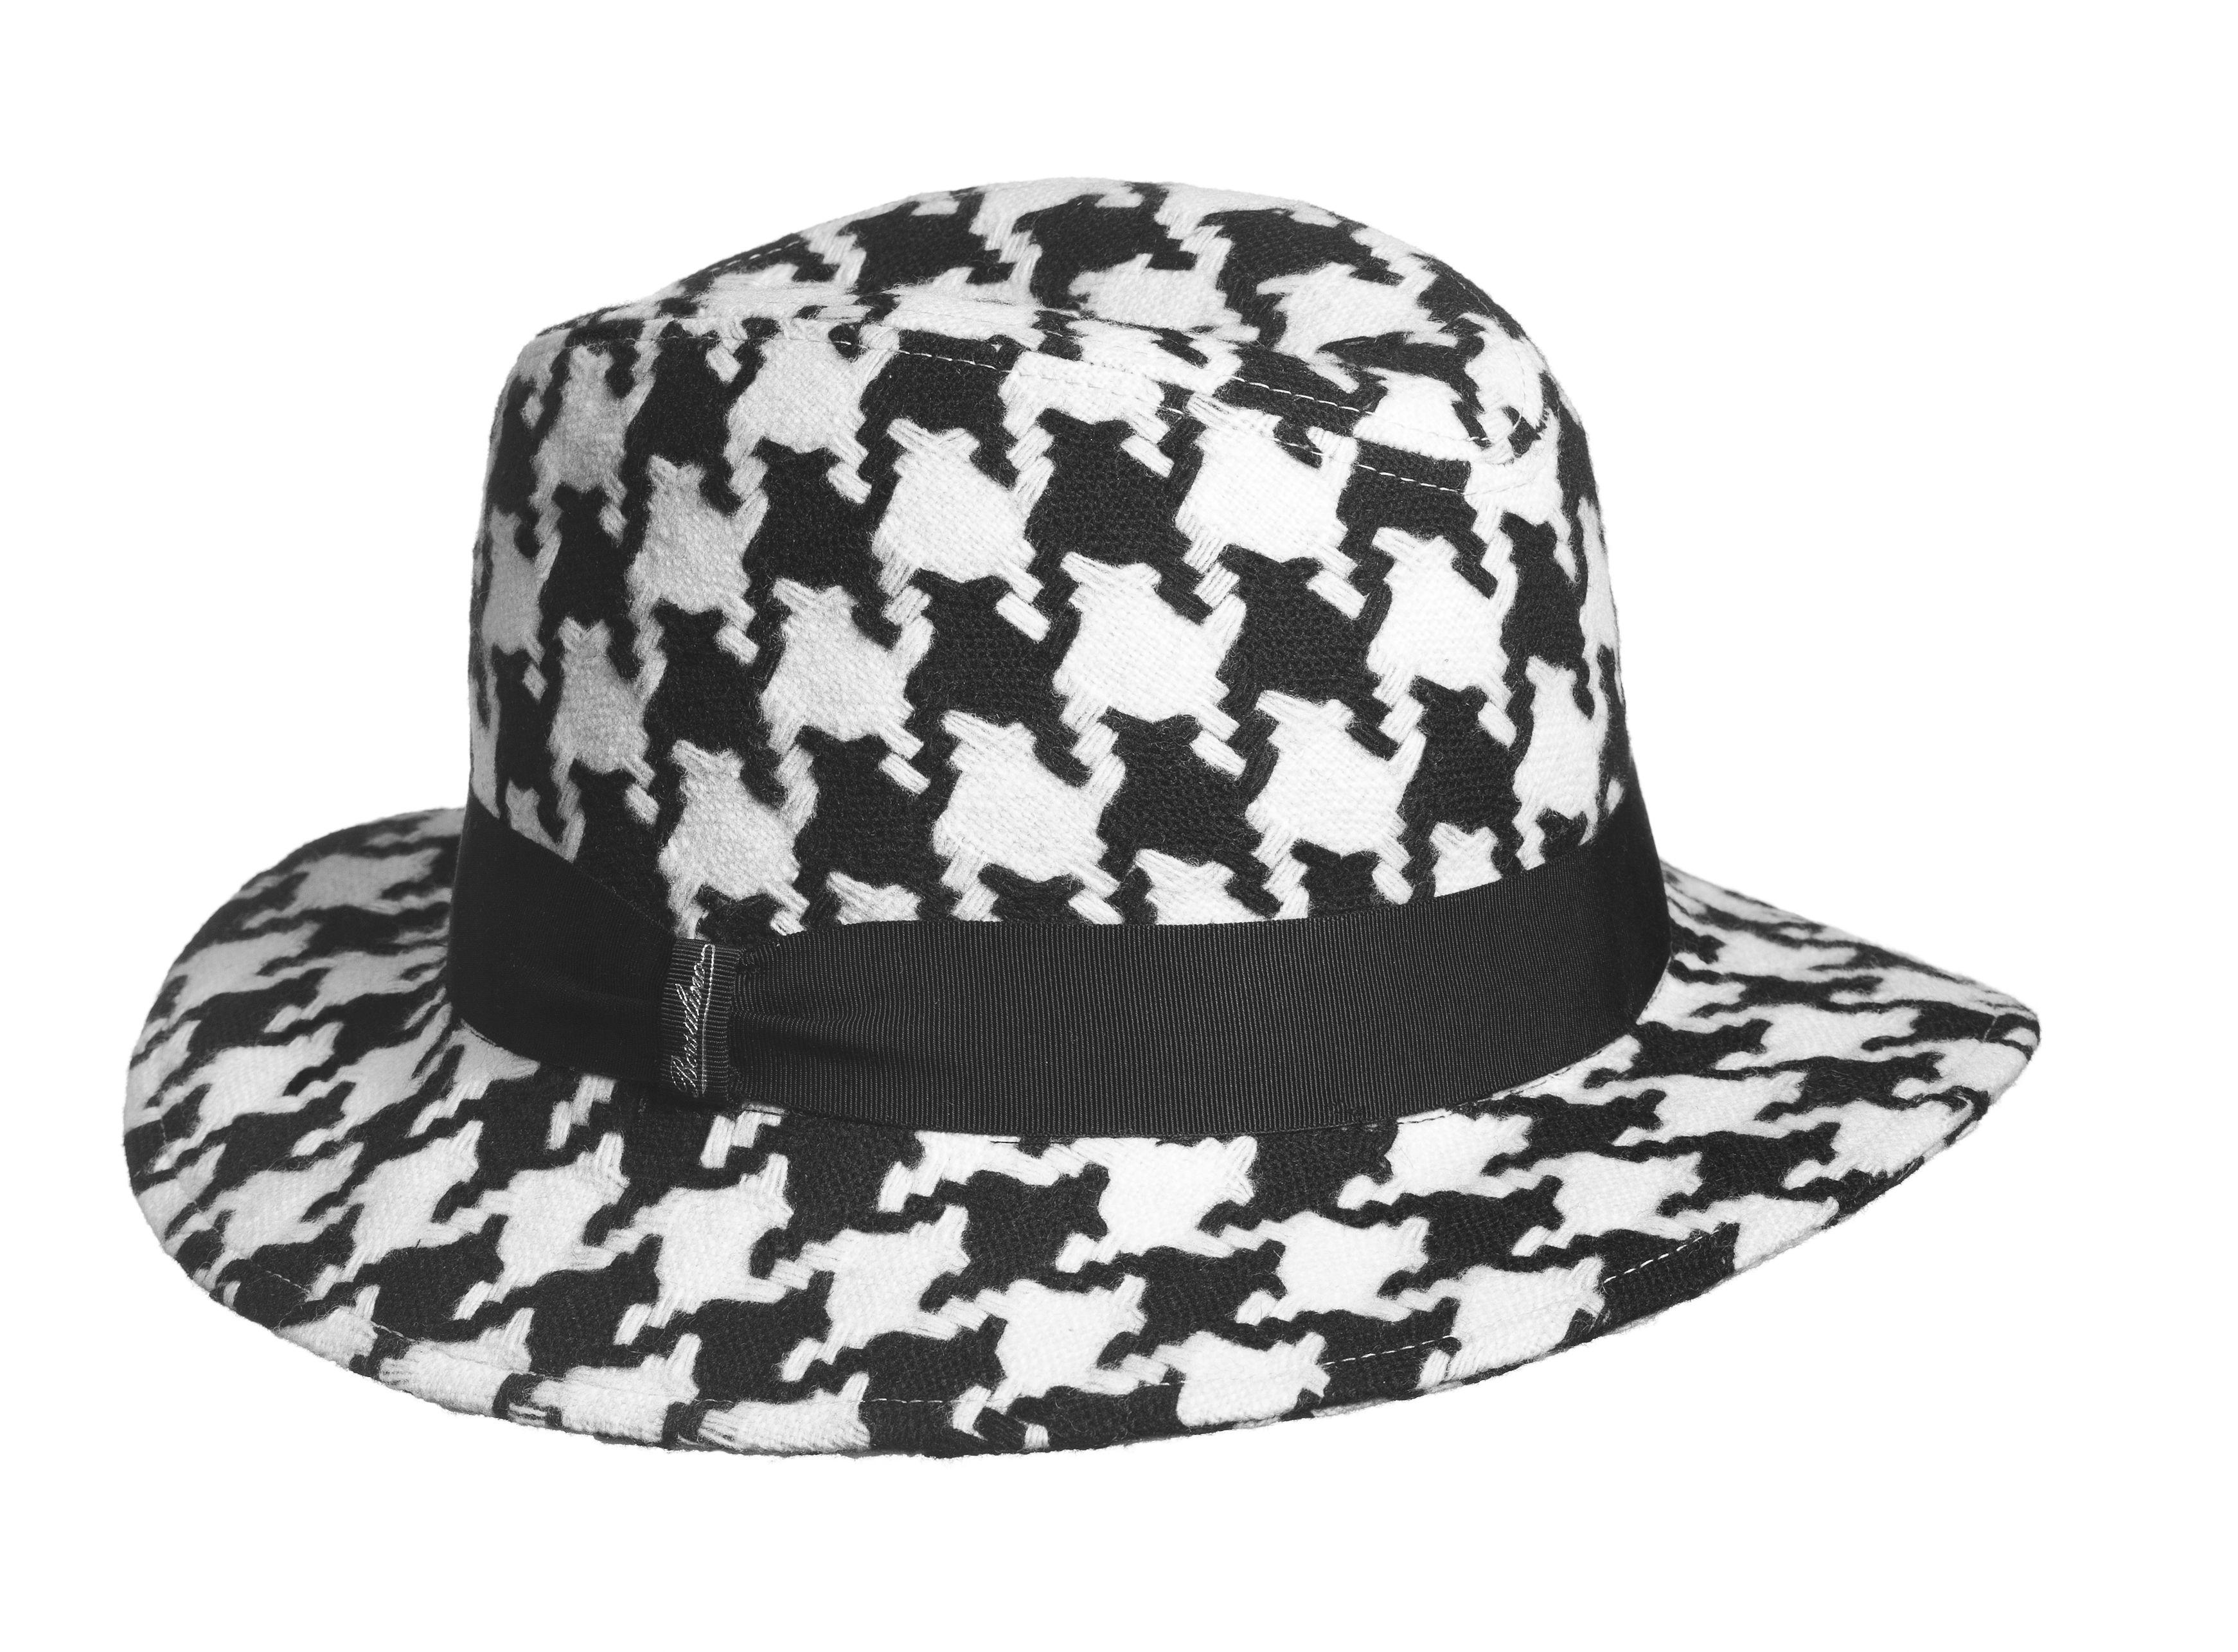 Borsalino cappello in tessuto pied poul forma borsalino ala media